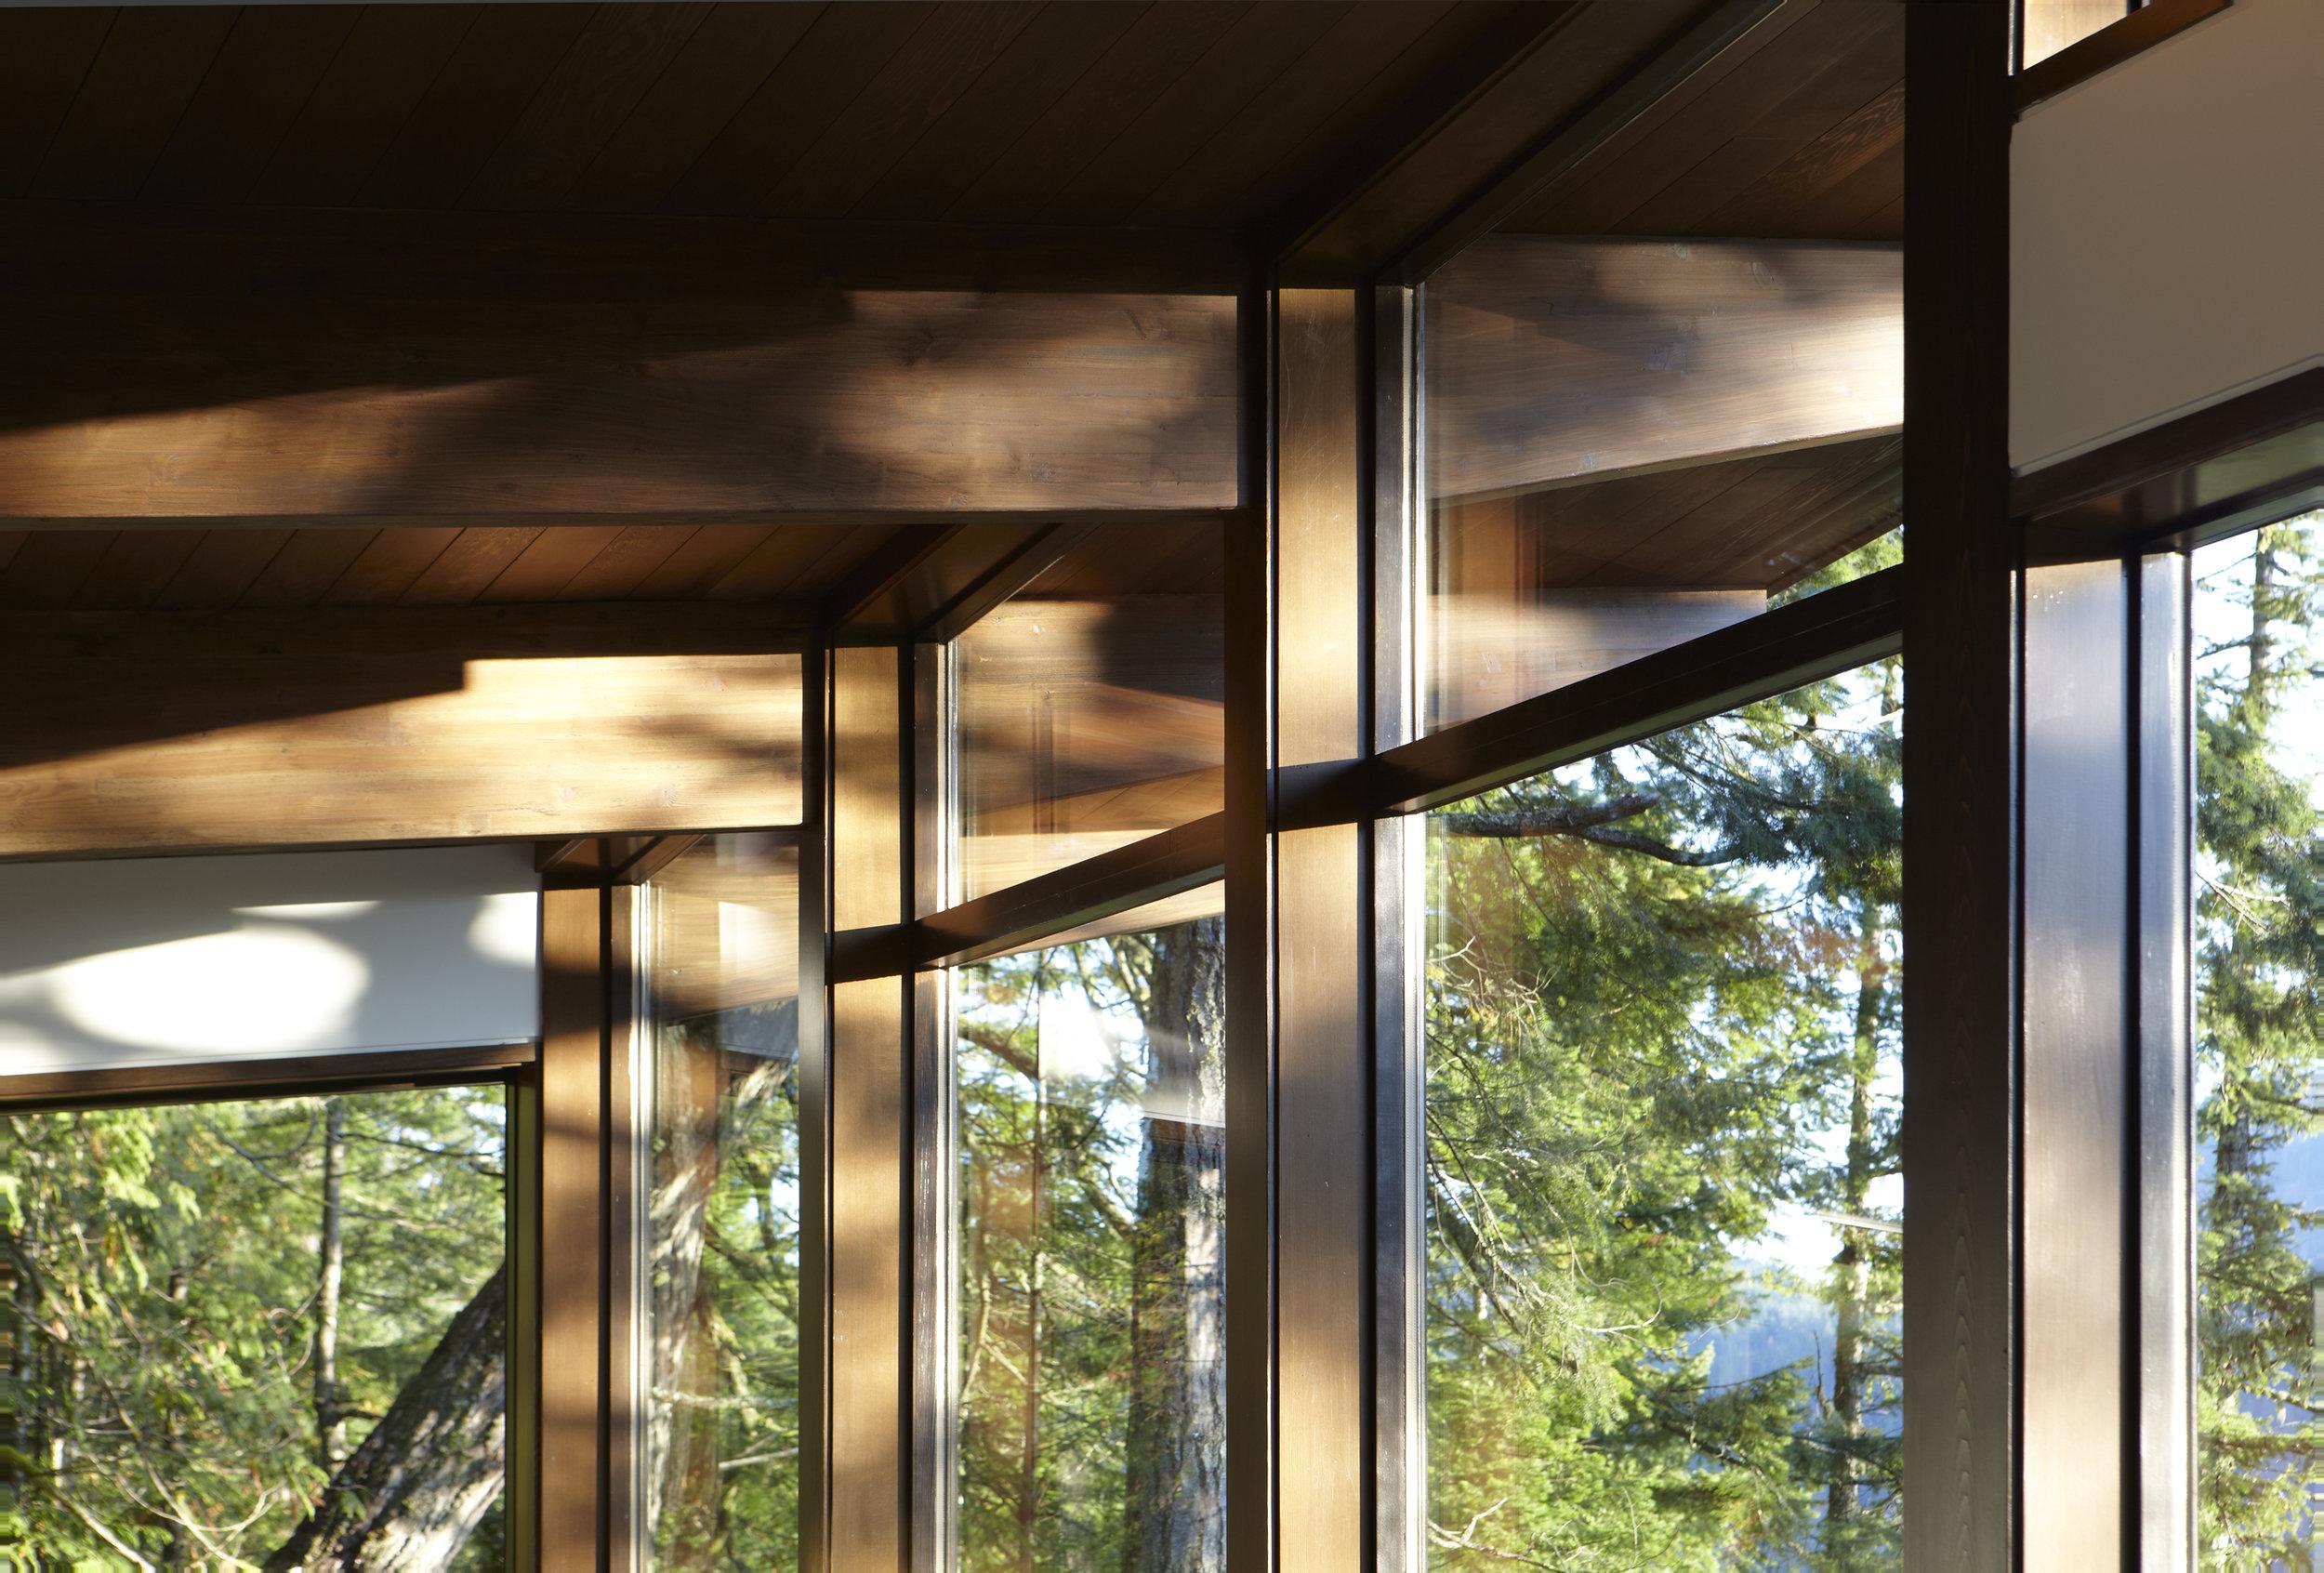 turkel_modern_design_prefab_gambier_island_house_windows.jpg